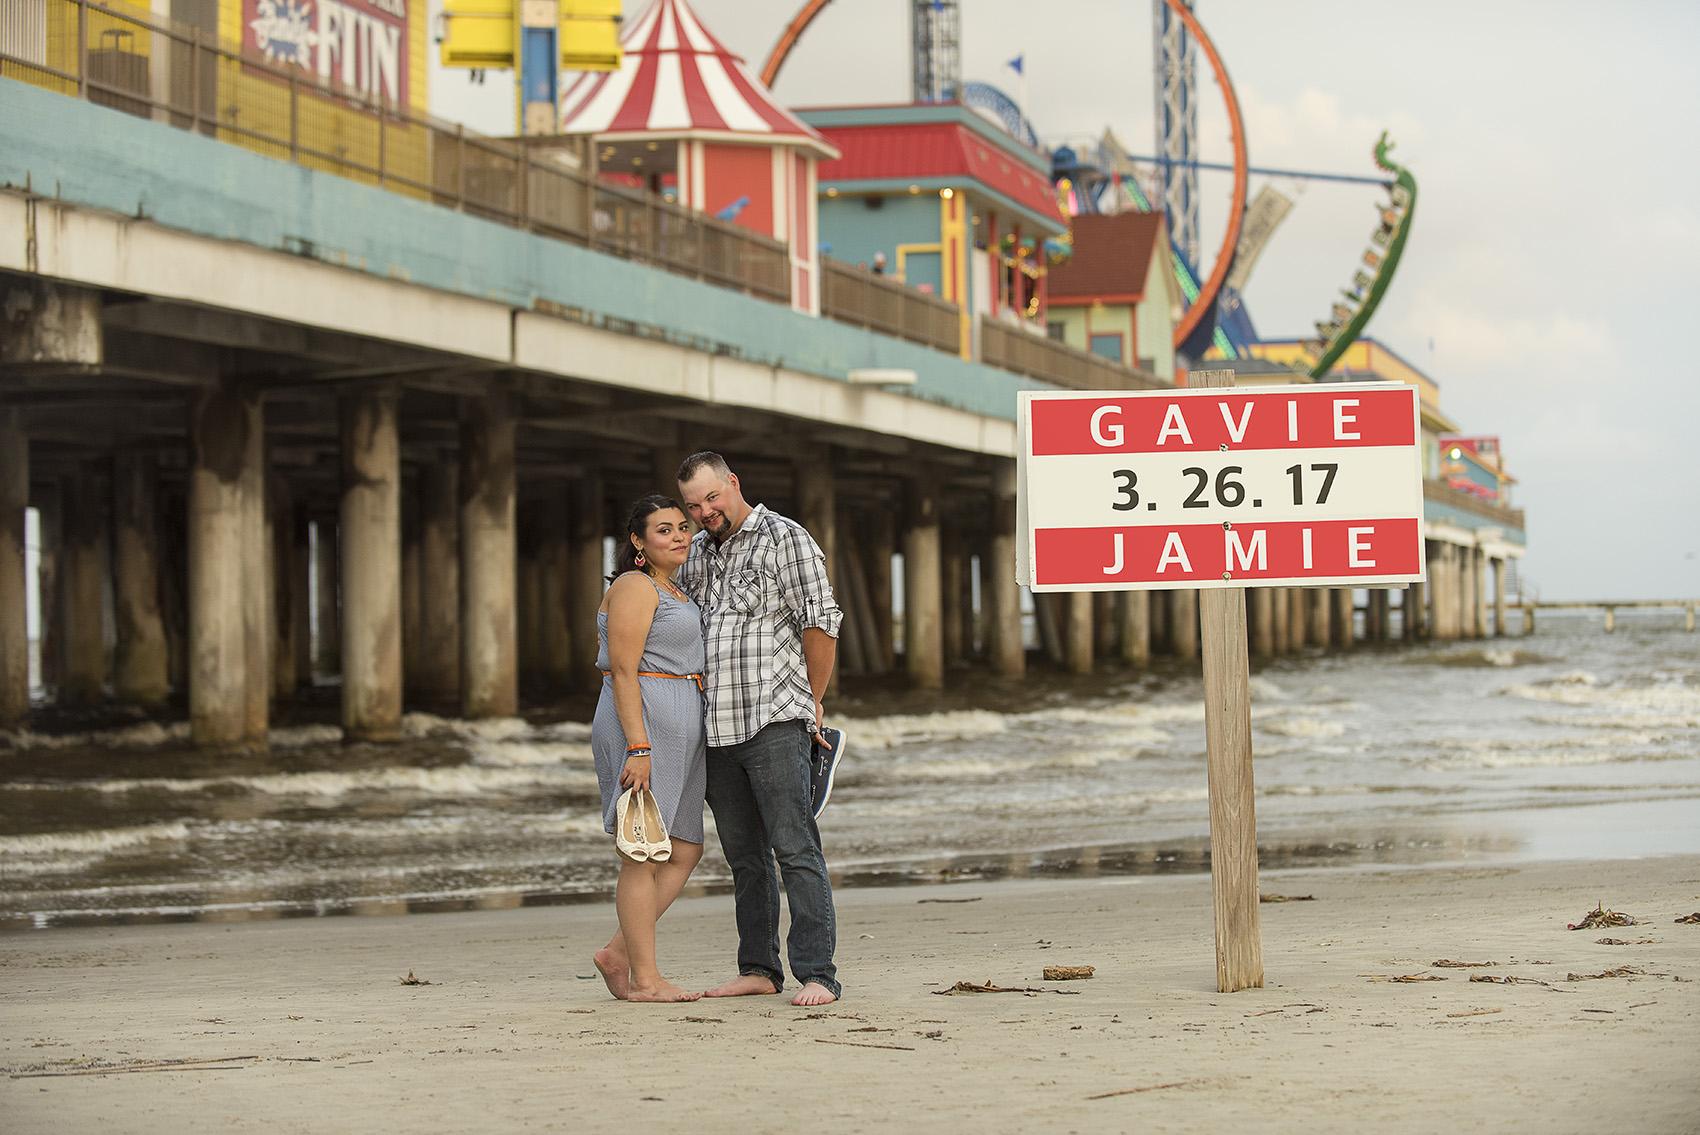 galveston beach pleasure pier creative fun modern egnagement photography